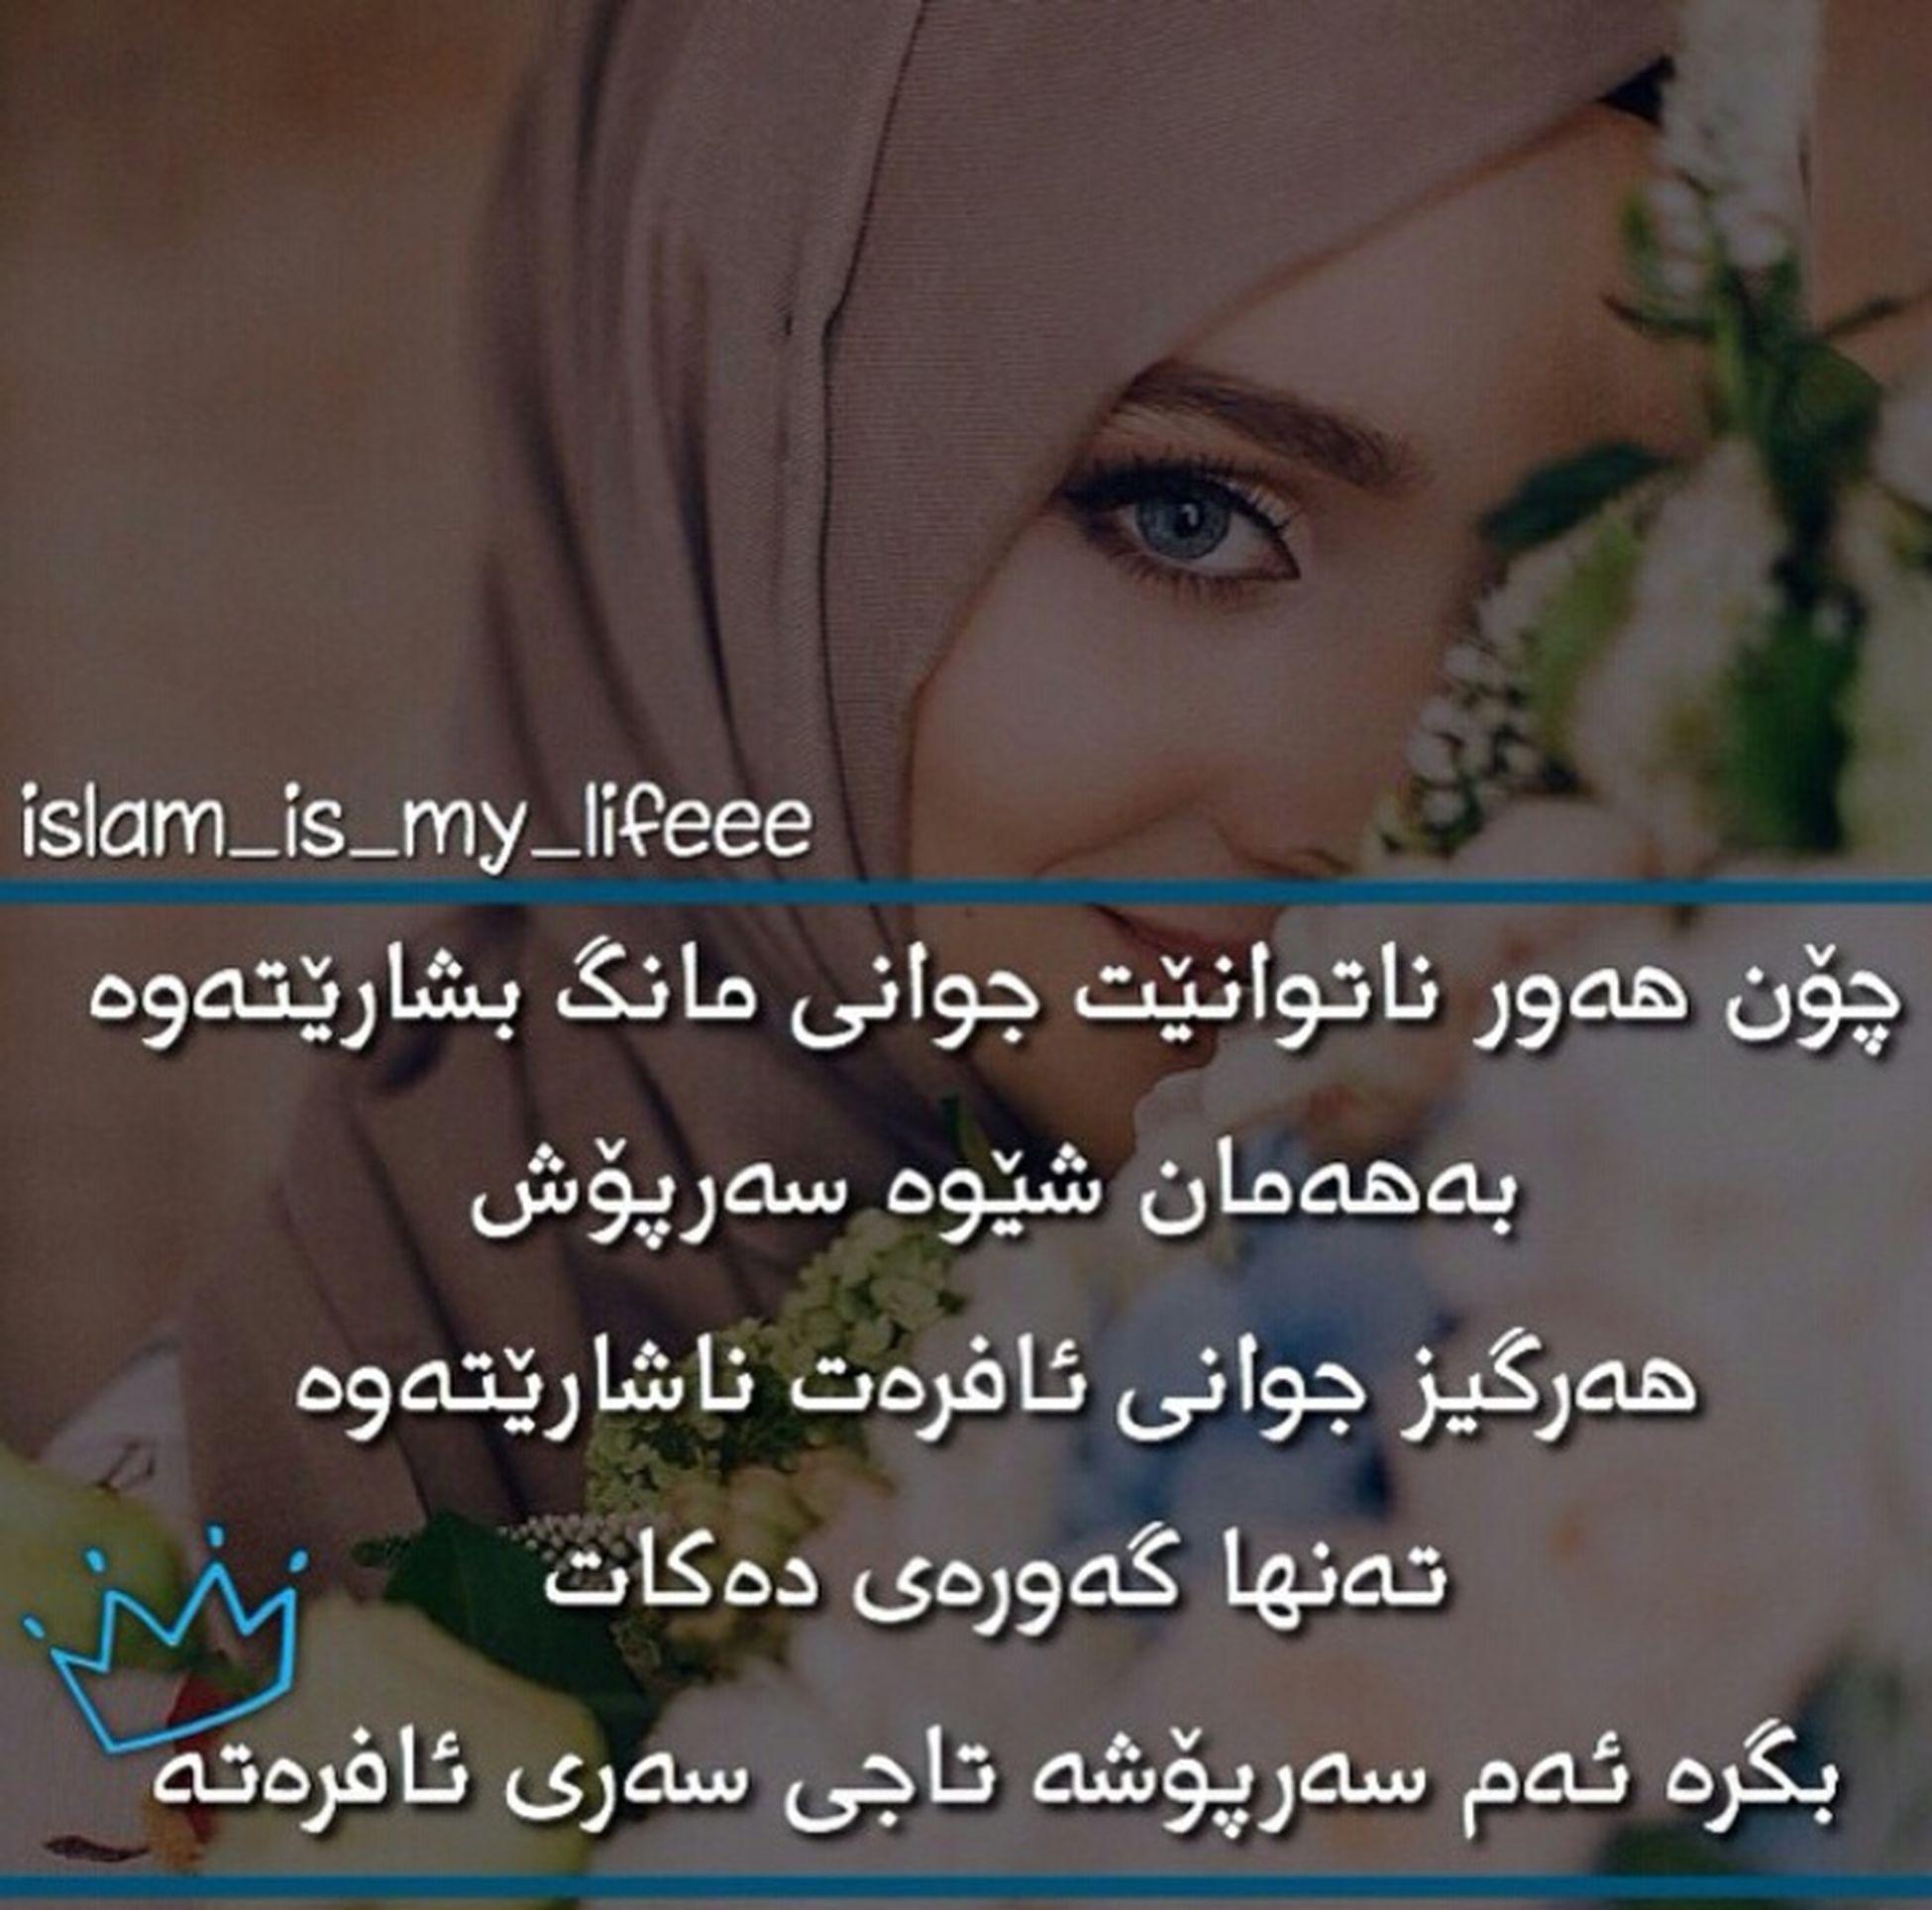 Hijab ♡♥♡ Viel Hijab Hijabstyle  Hijablovers Hijablook Hijablove ISLAM♥ Love ♥ Heart ❤ Lovelovelove